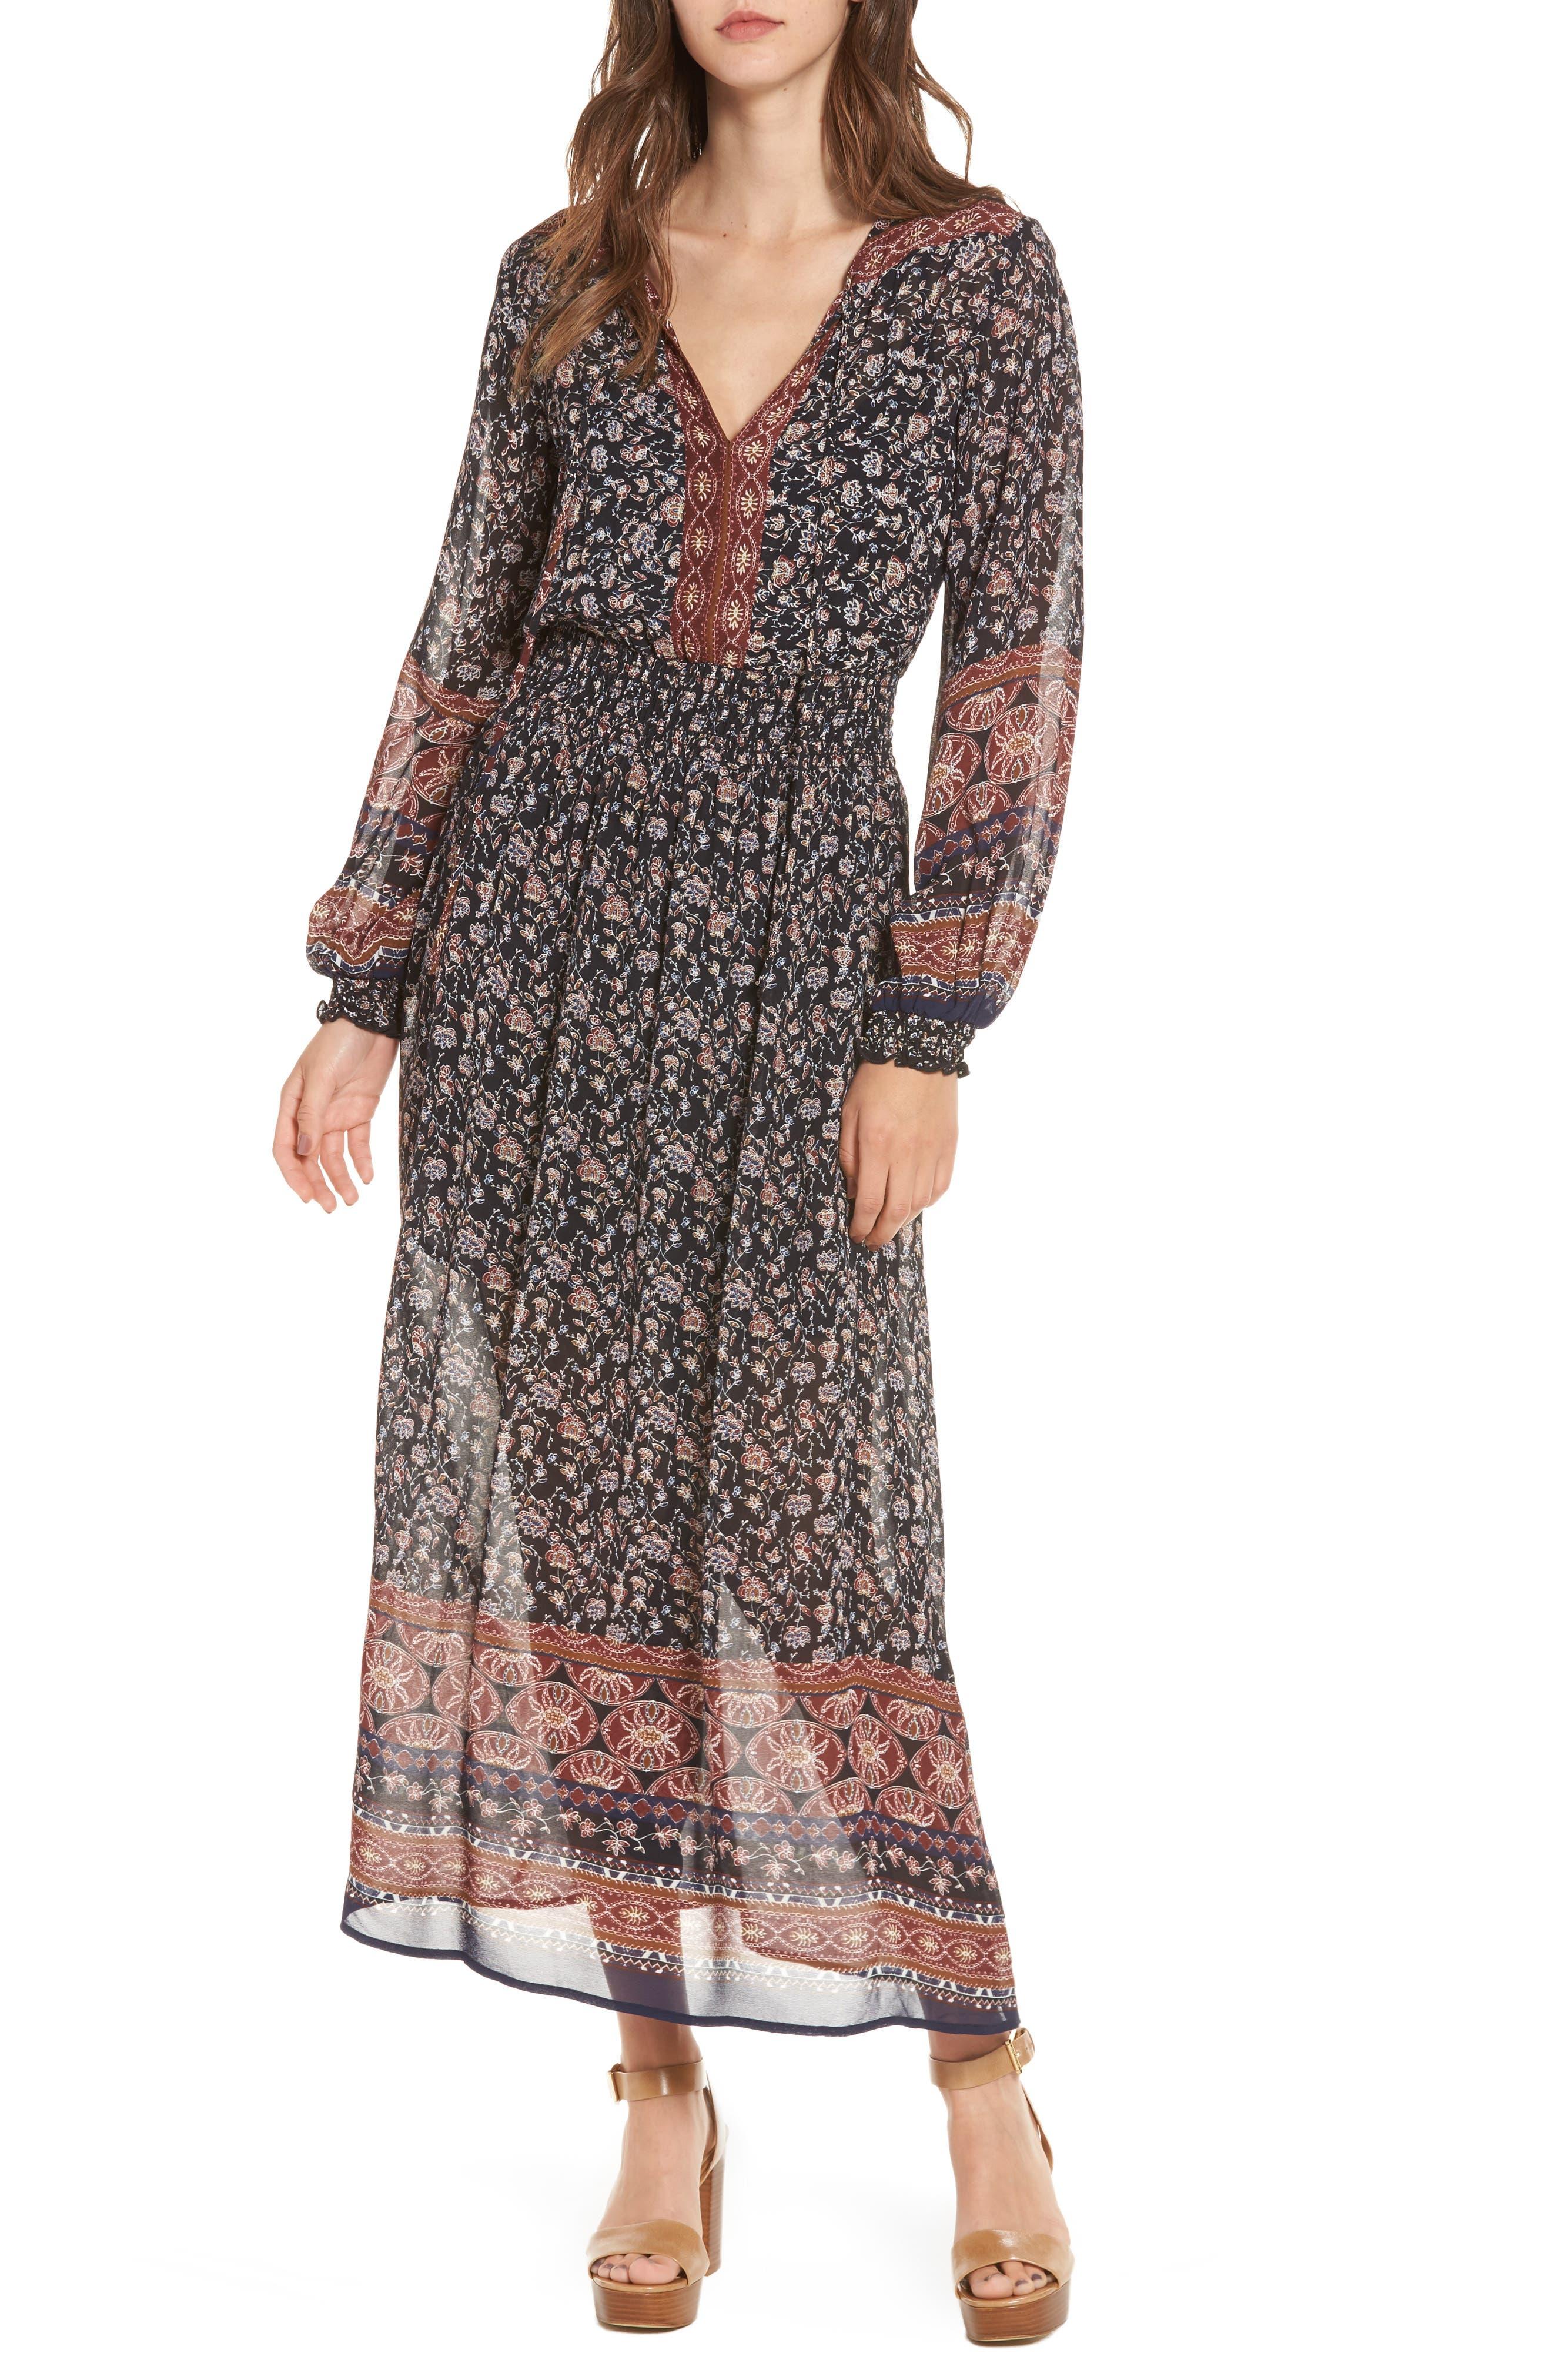 Eden Dress,                         Main,                         color, Black Multi Border